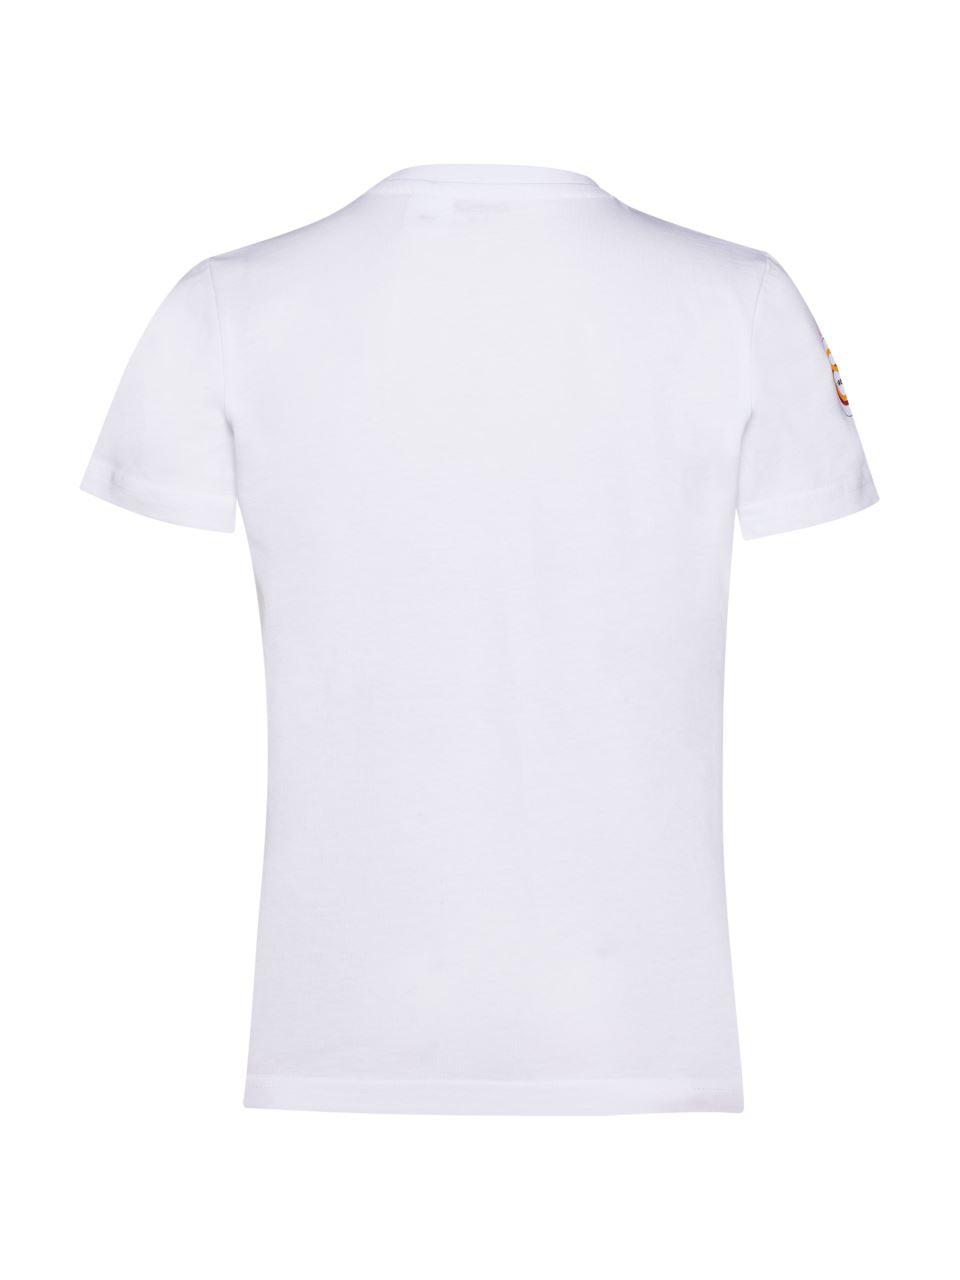 C95332 Kısa Kollu T-shirt (GS 001)